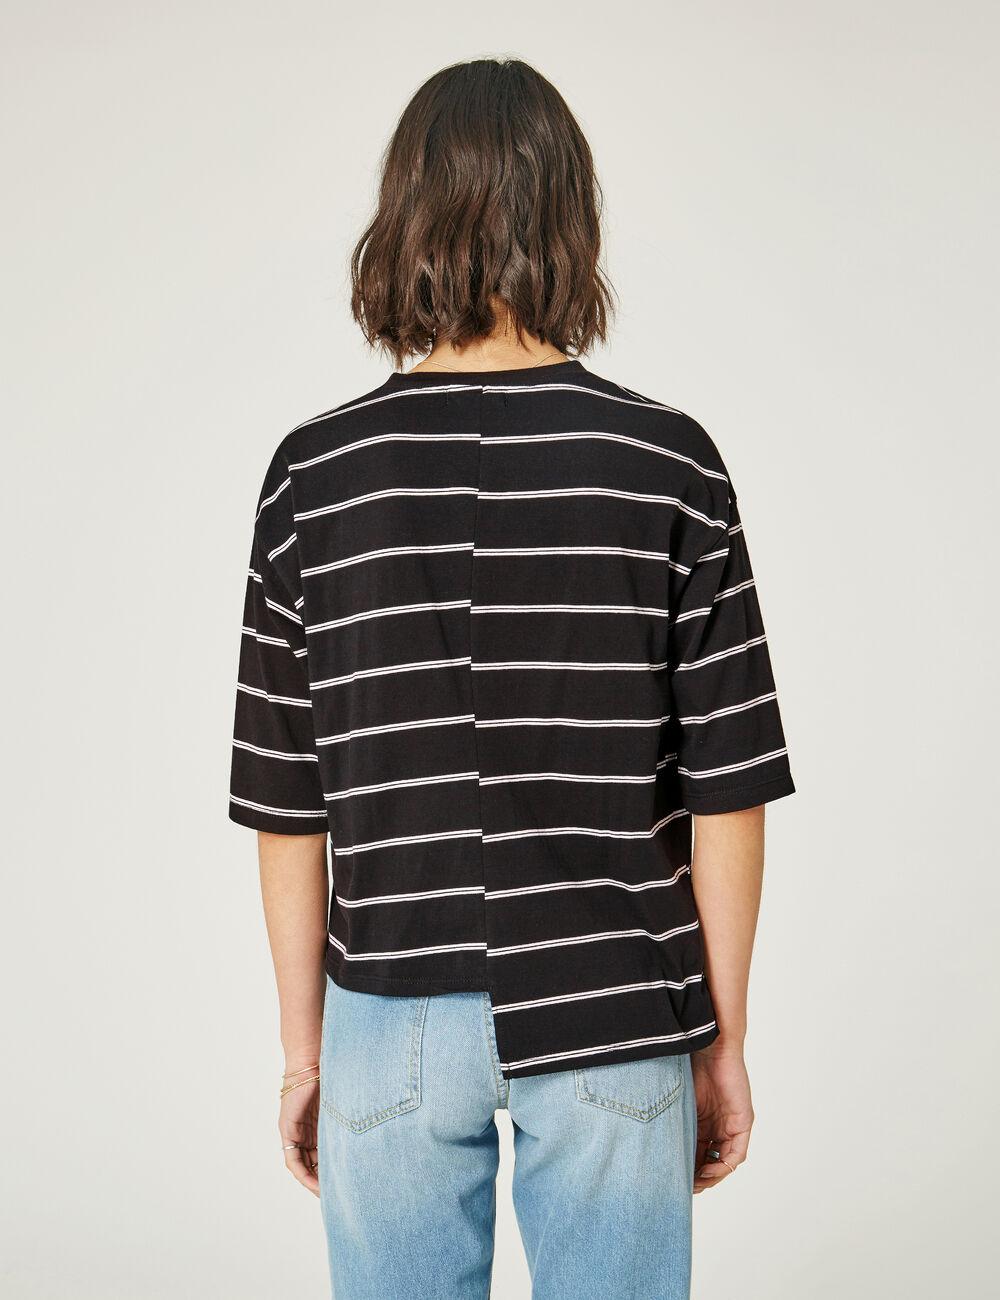 tee shirt asym trique ray noir et blanc femme jennyfer. Black Bedroom Furniture Sets. Home Design Ideas